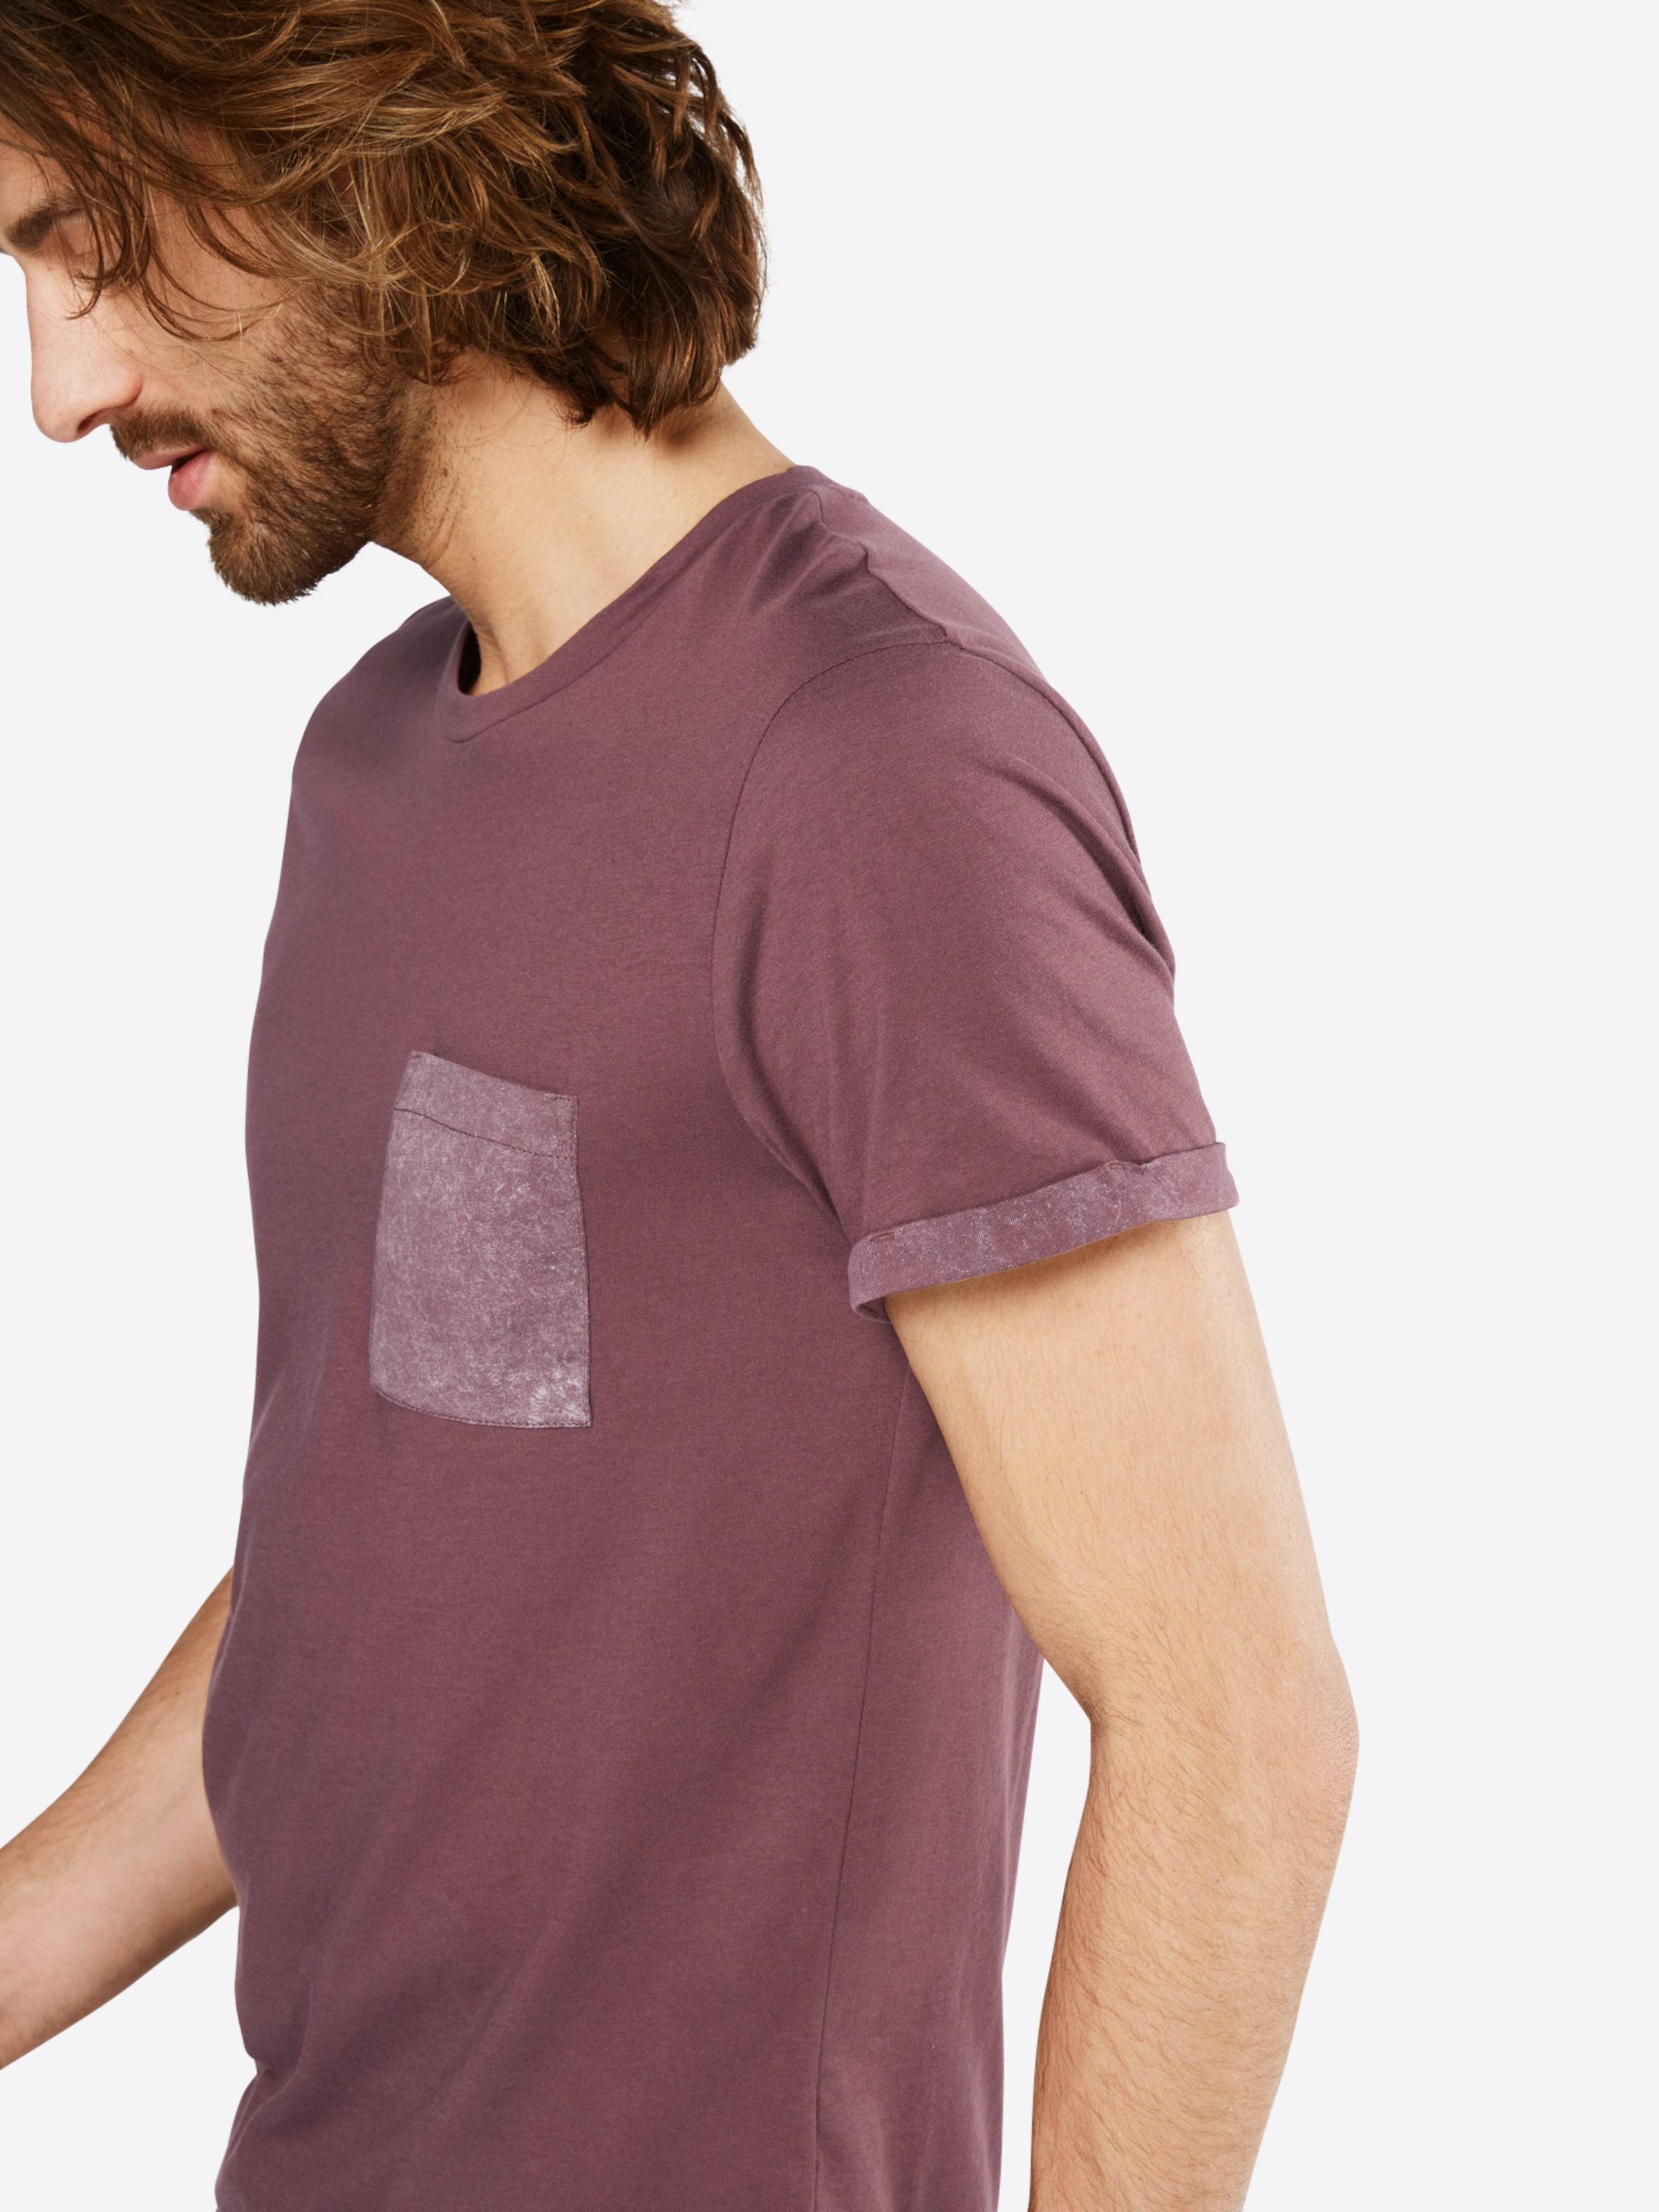 Shirt T turnup' TAILOR TOM DENIM washed w 'Tee pocket and fqEwtwaR